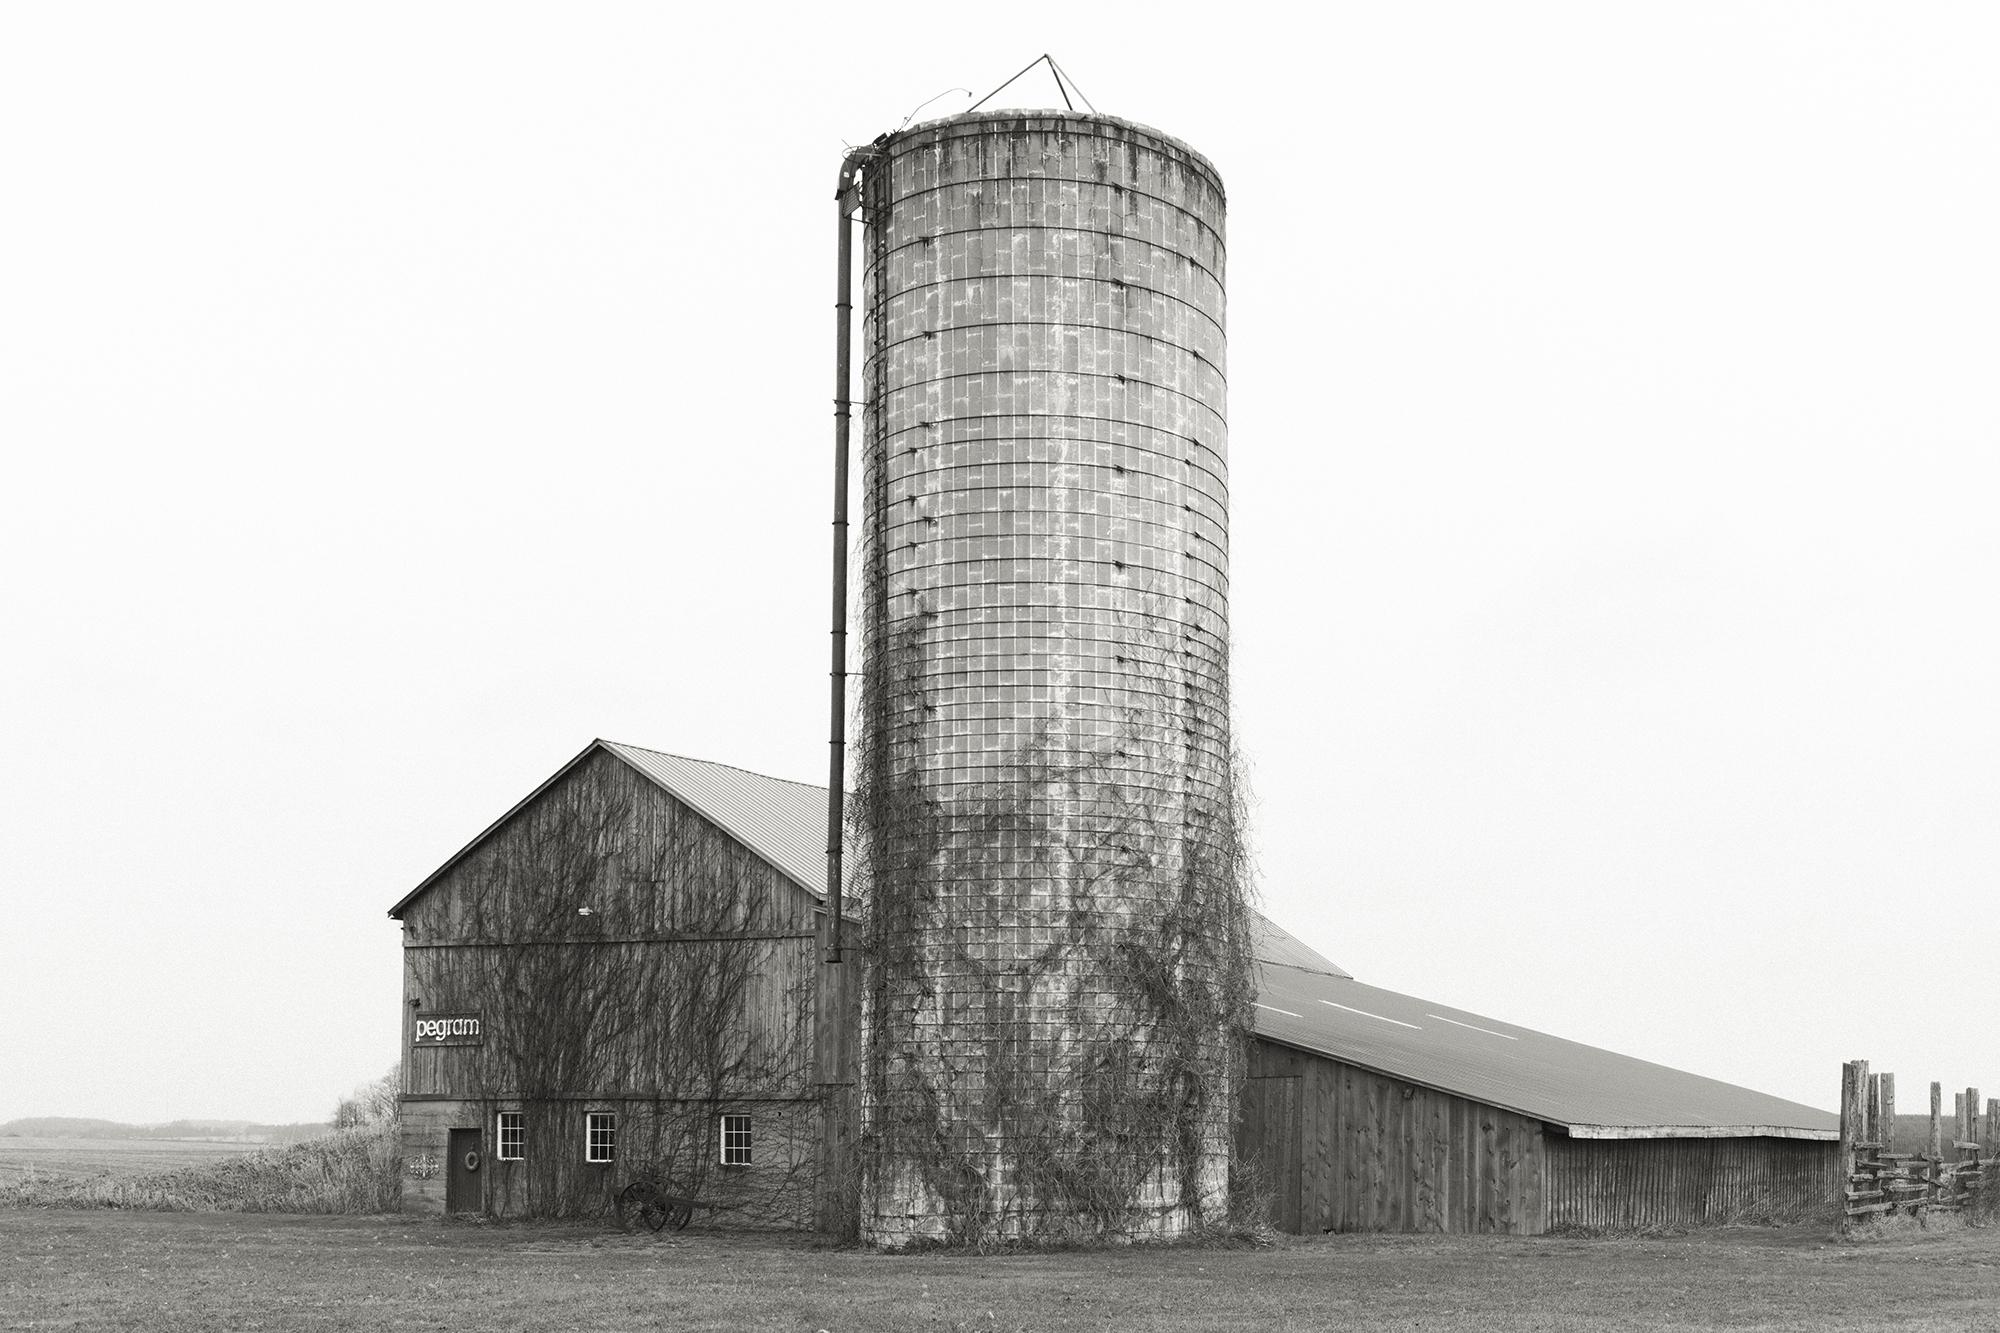 Photograph from the portfolio of David Brandy